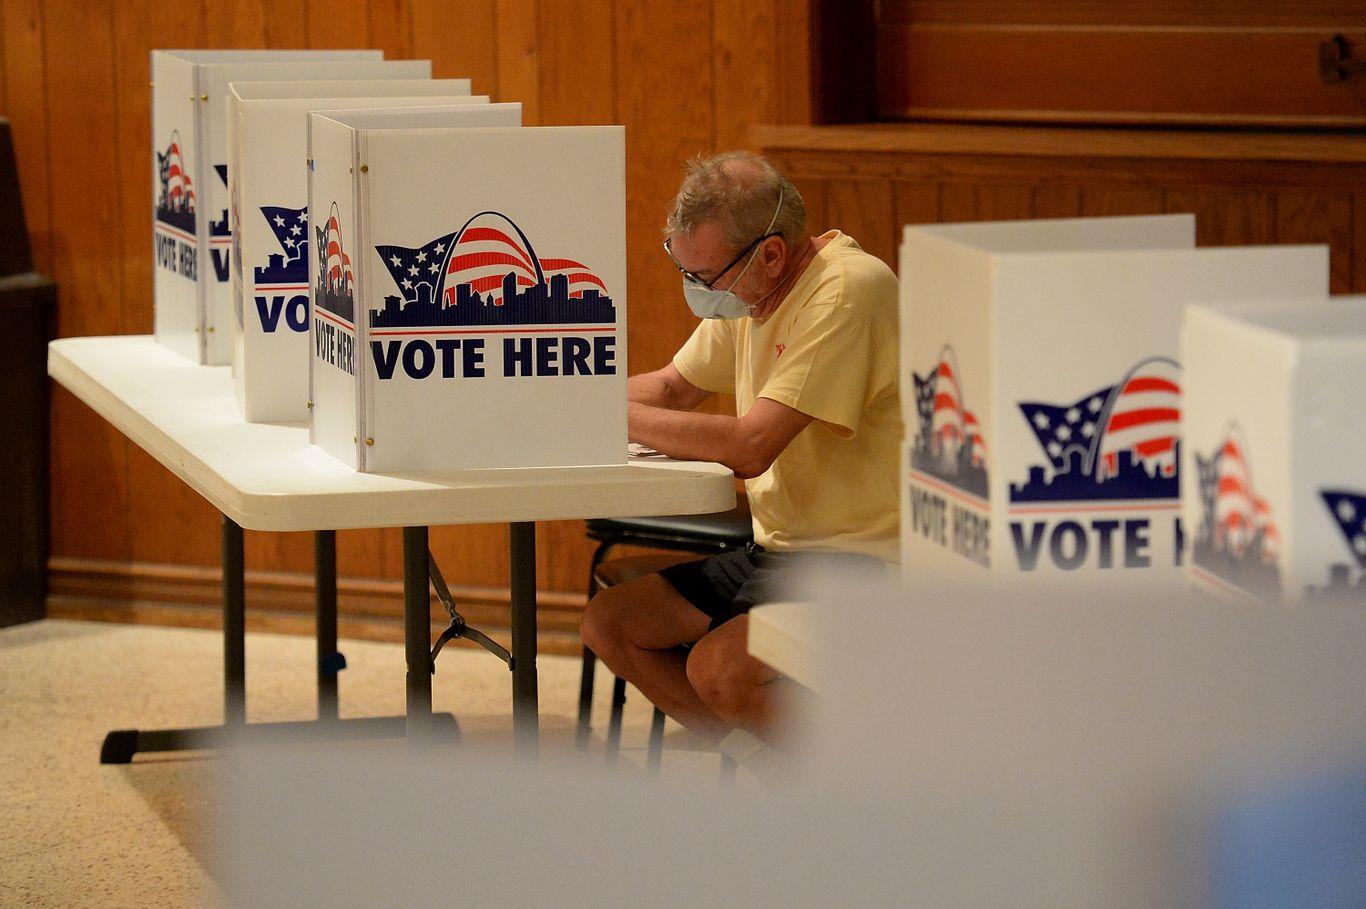 Aug. 4 primaries: Voters visit the polls in Arizona, Kansas, Michigan, Missouri and Washington thumbnail